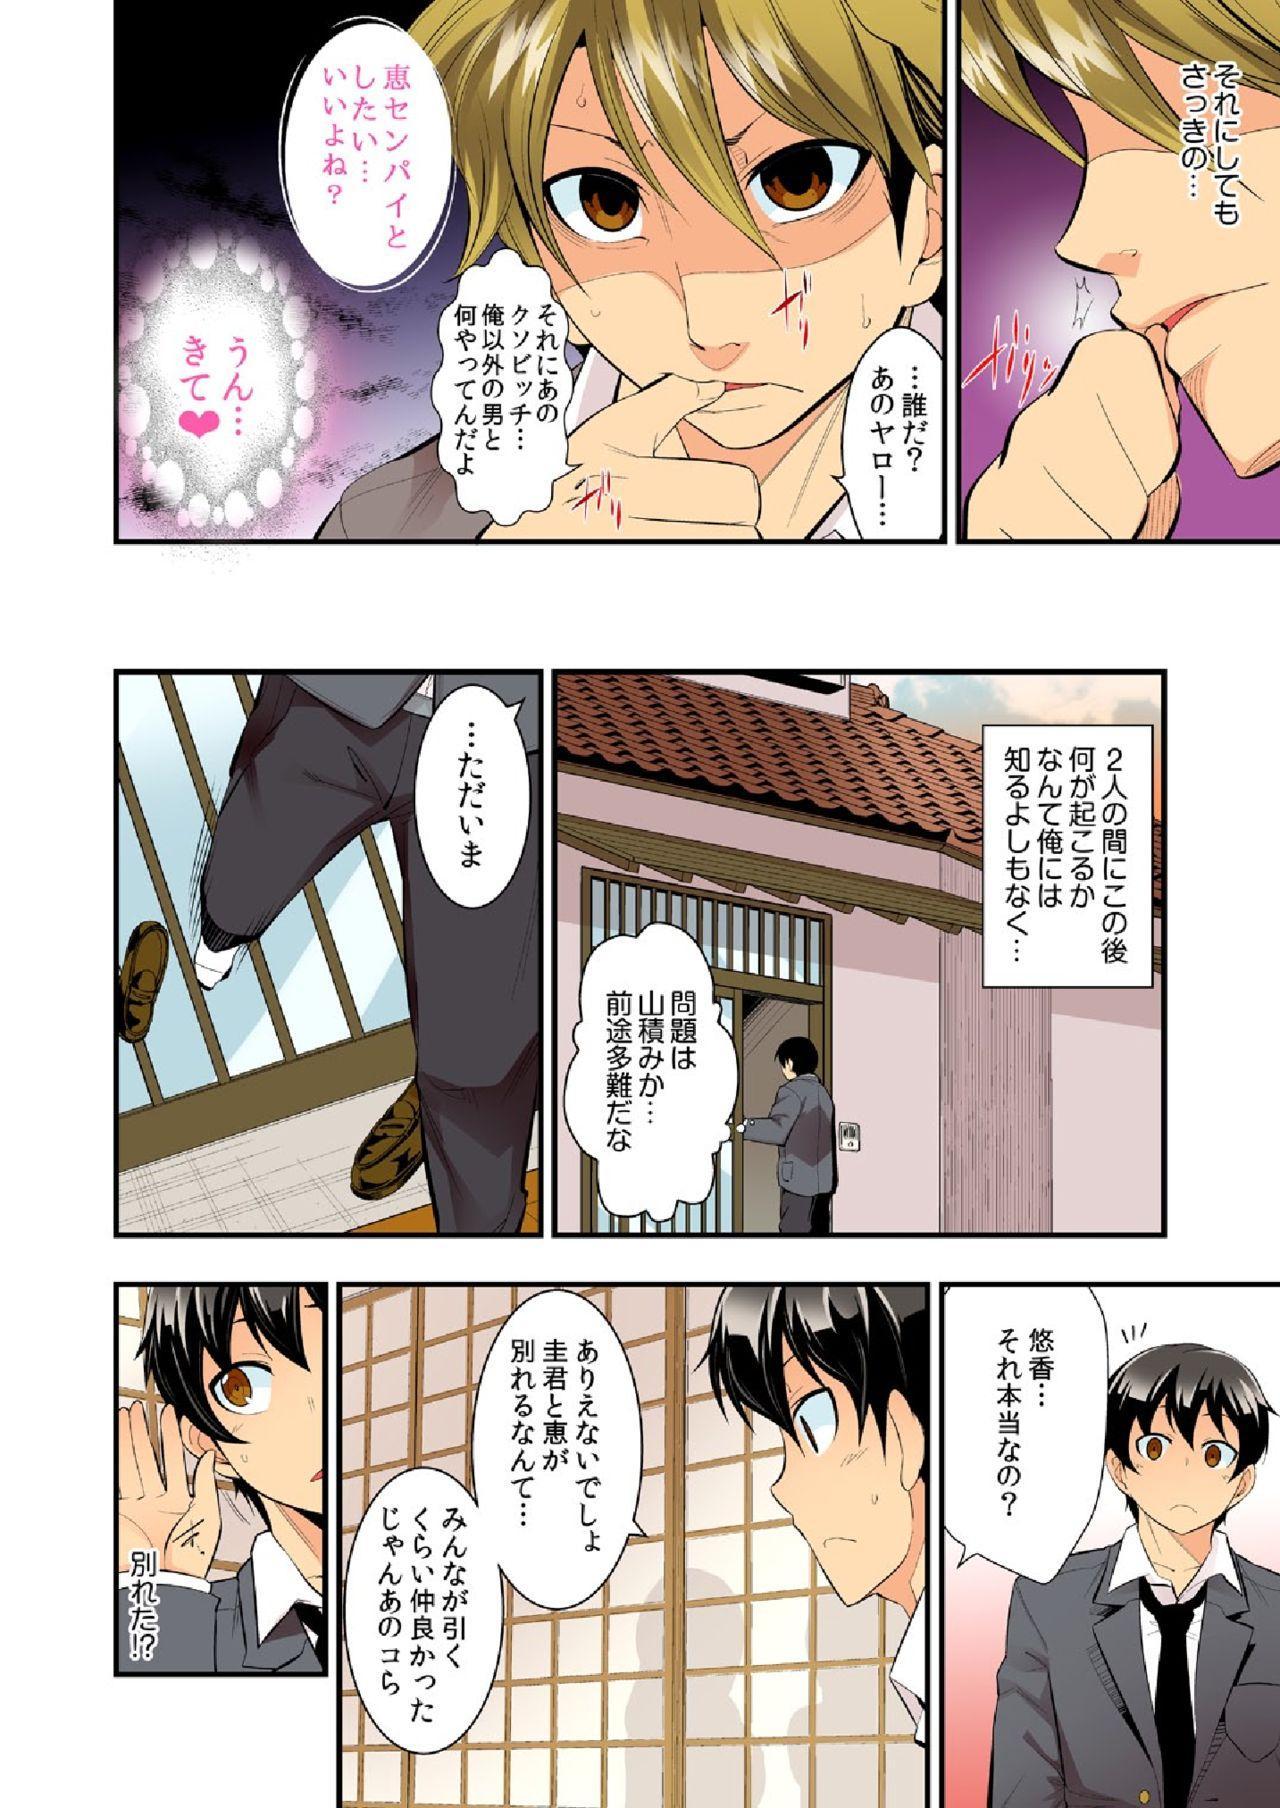 Dakimakura ni Natte Yatte mita. 28